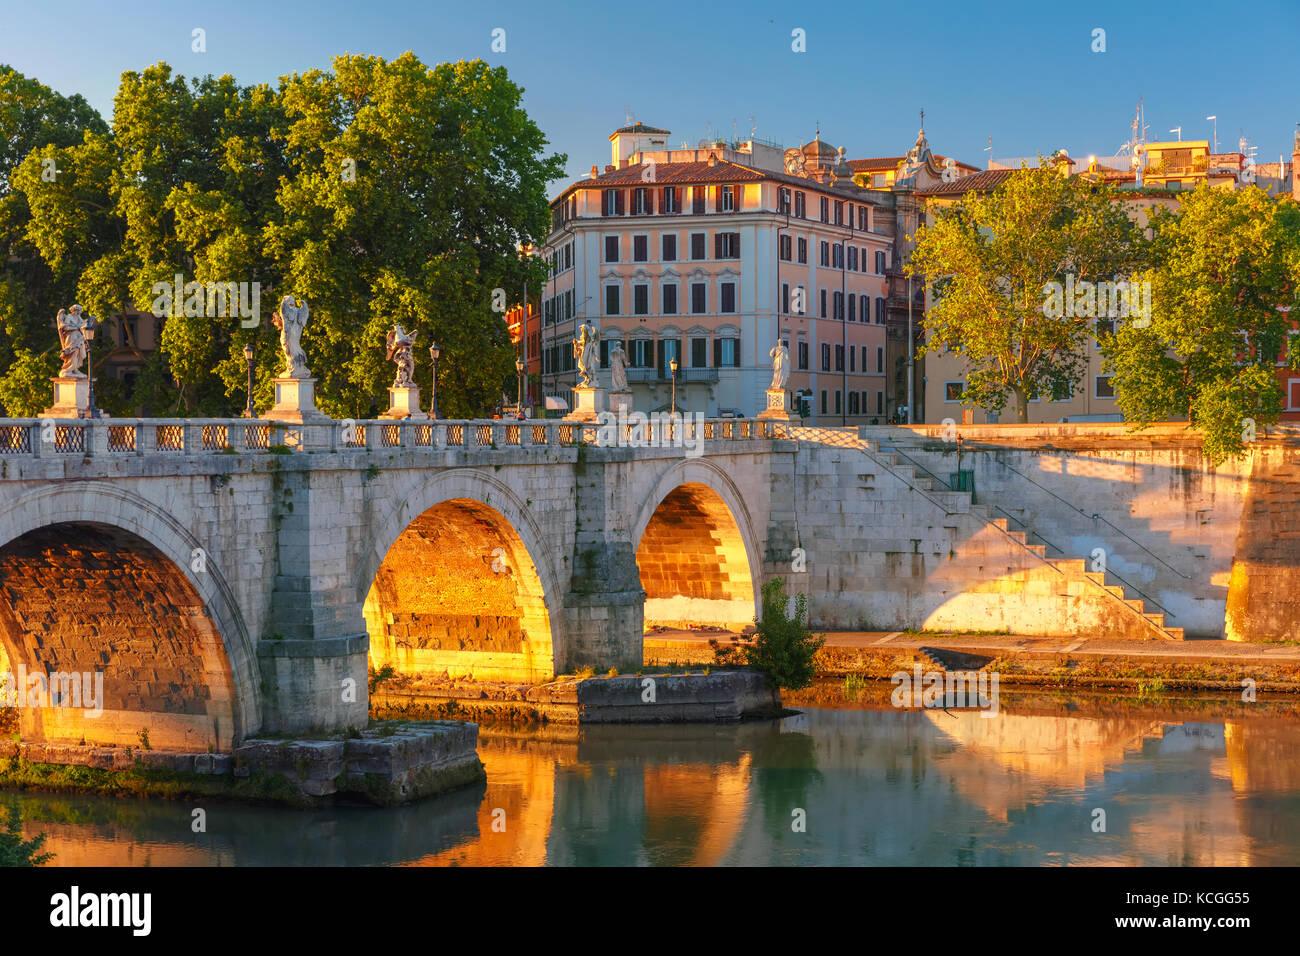 Saint Angel bridge at sunrise, Rome, Italy. - Stock Image